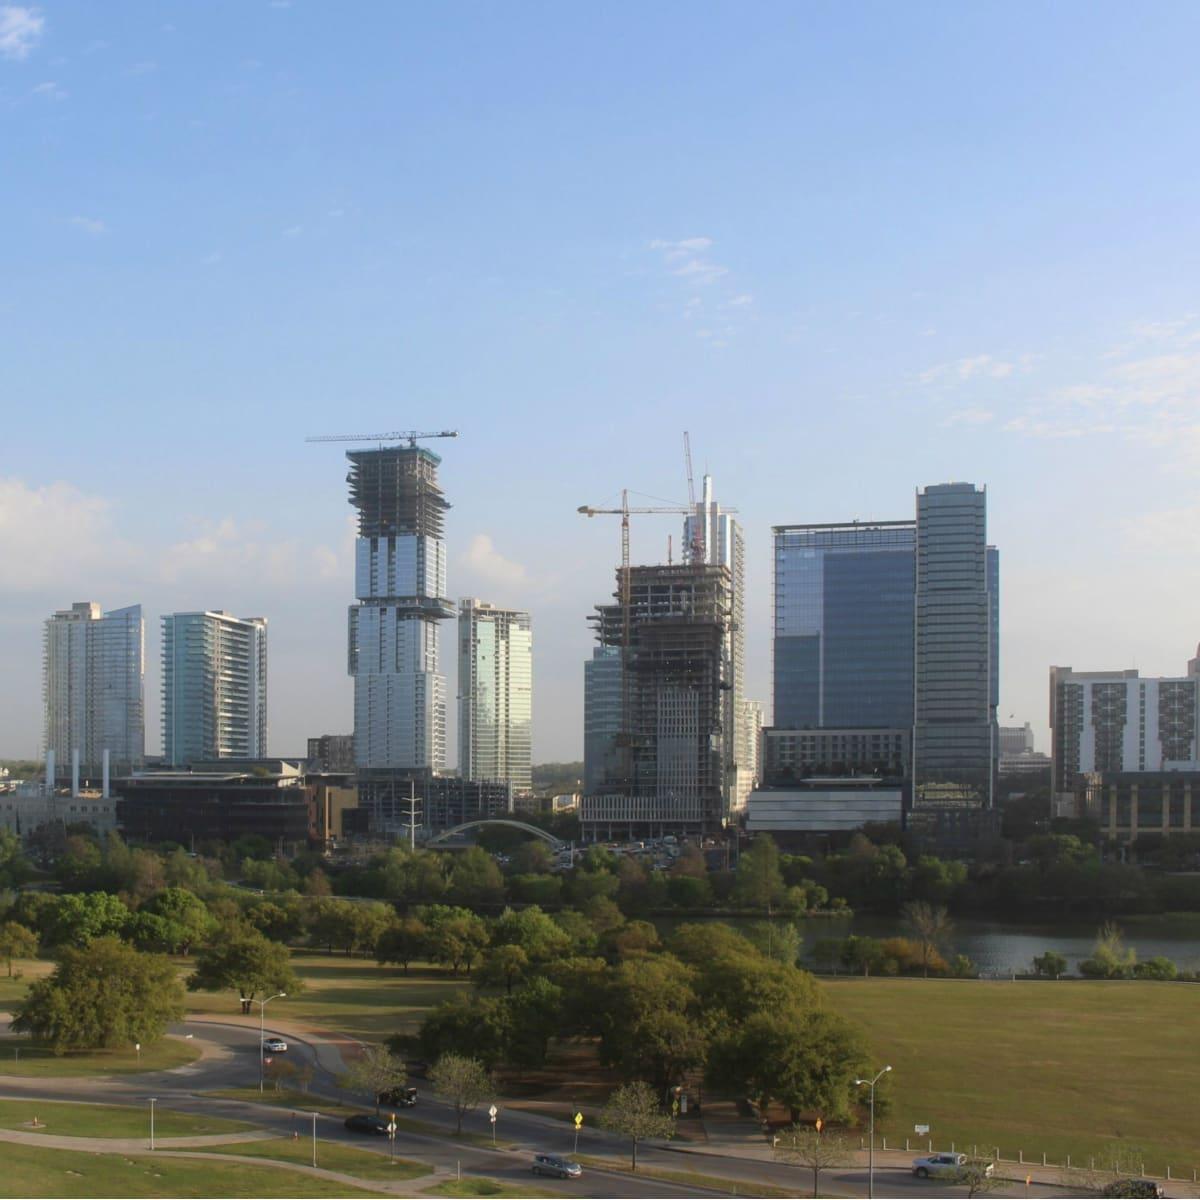 The Independent Austin condos